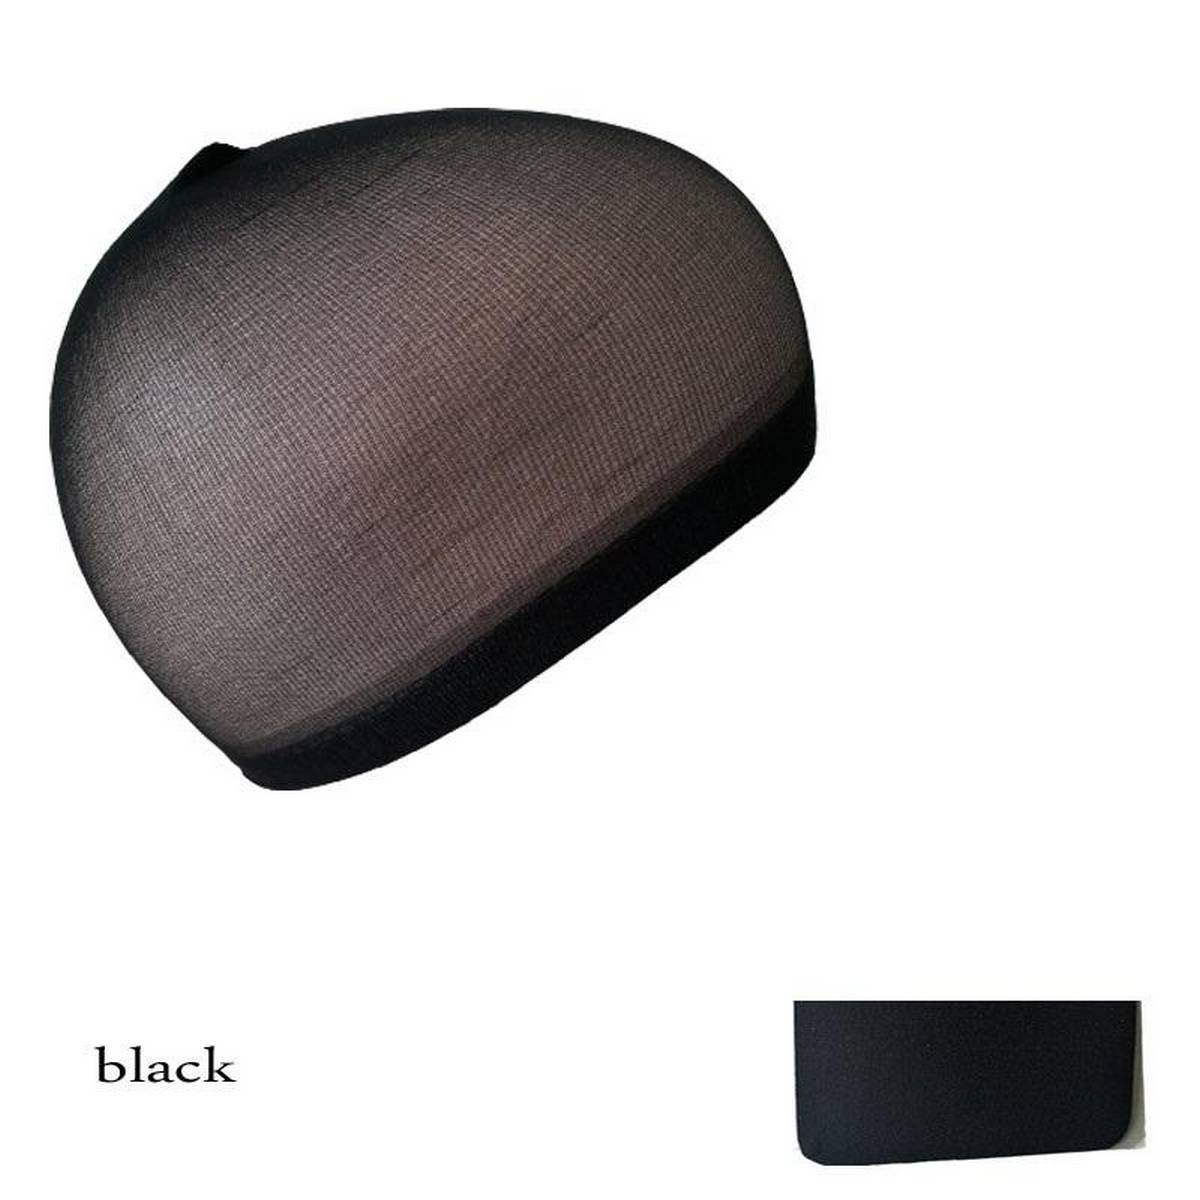 Hairnets Black Invisible Soft Elastic Lines Hair Net Wigs Weaving Mesh Net Fishnet Ladies Elastic Wig Caps